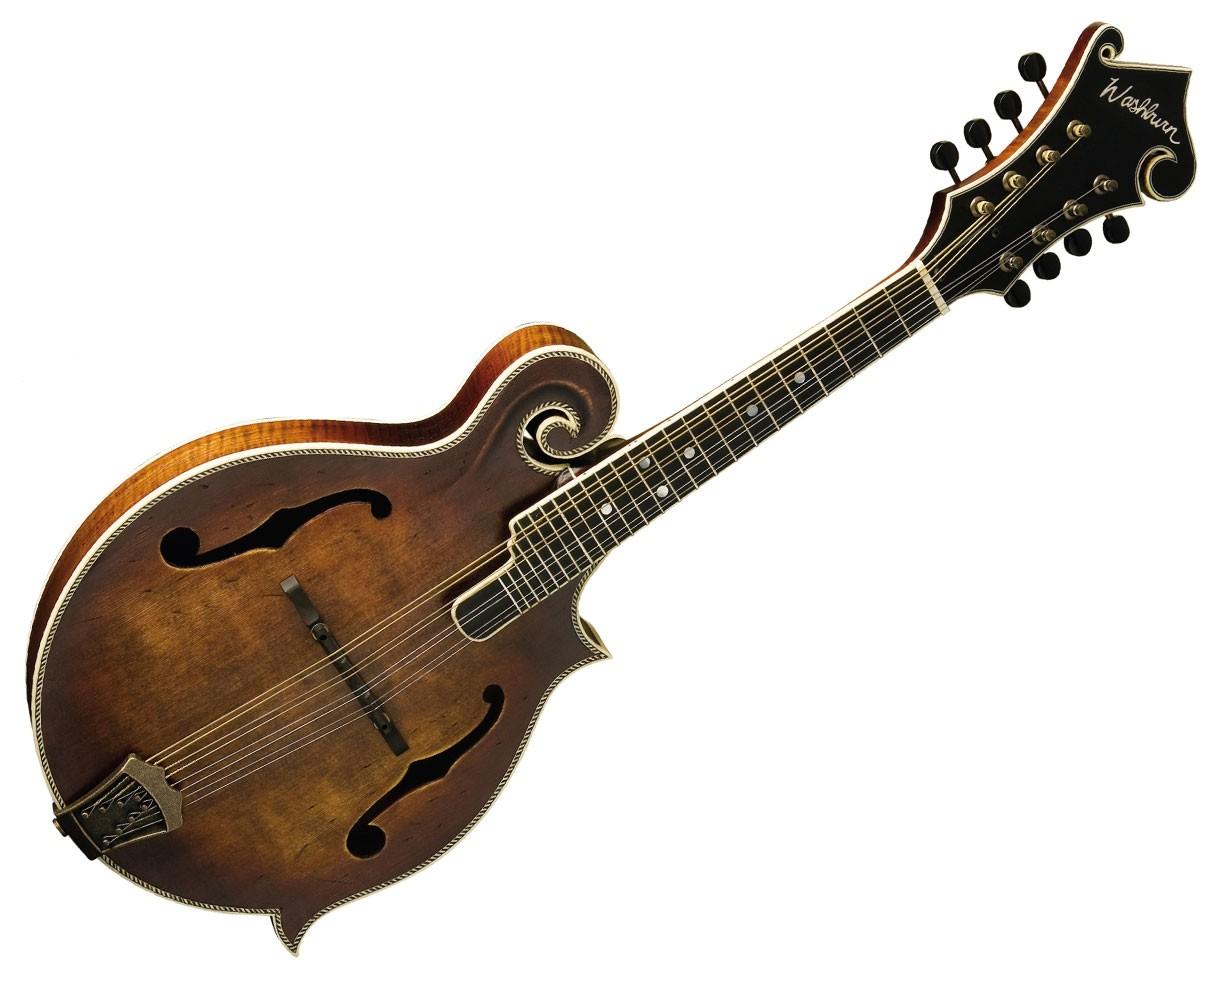 Washburn M118SWK Vintage Florentine Mandolin Natural with Case